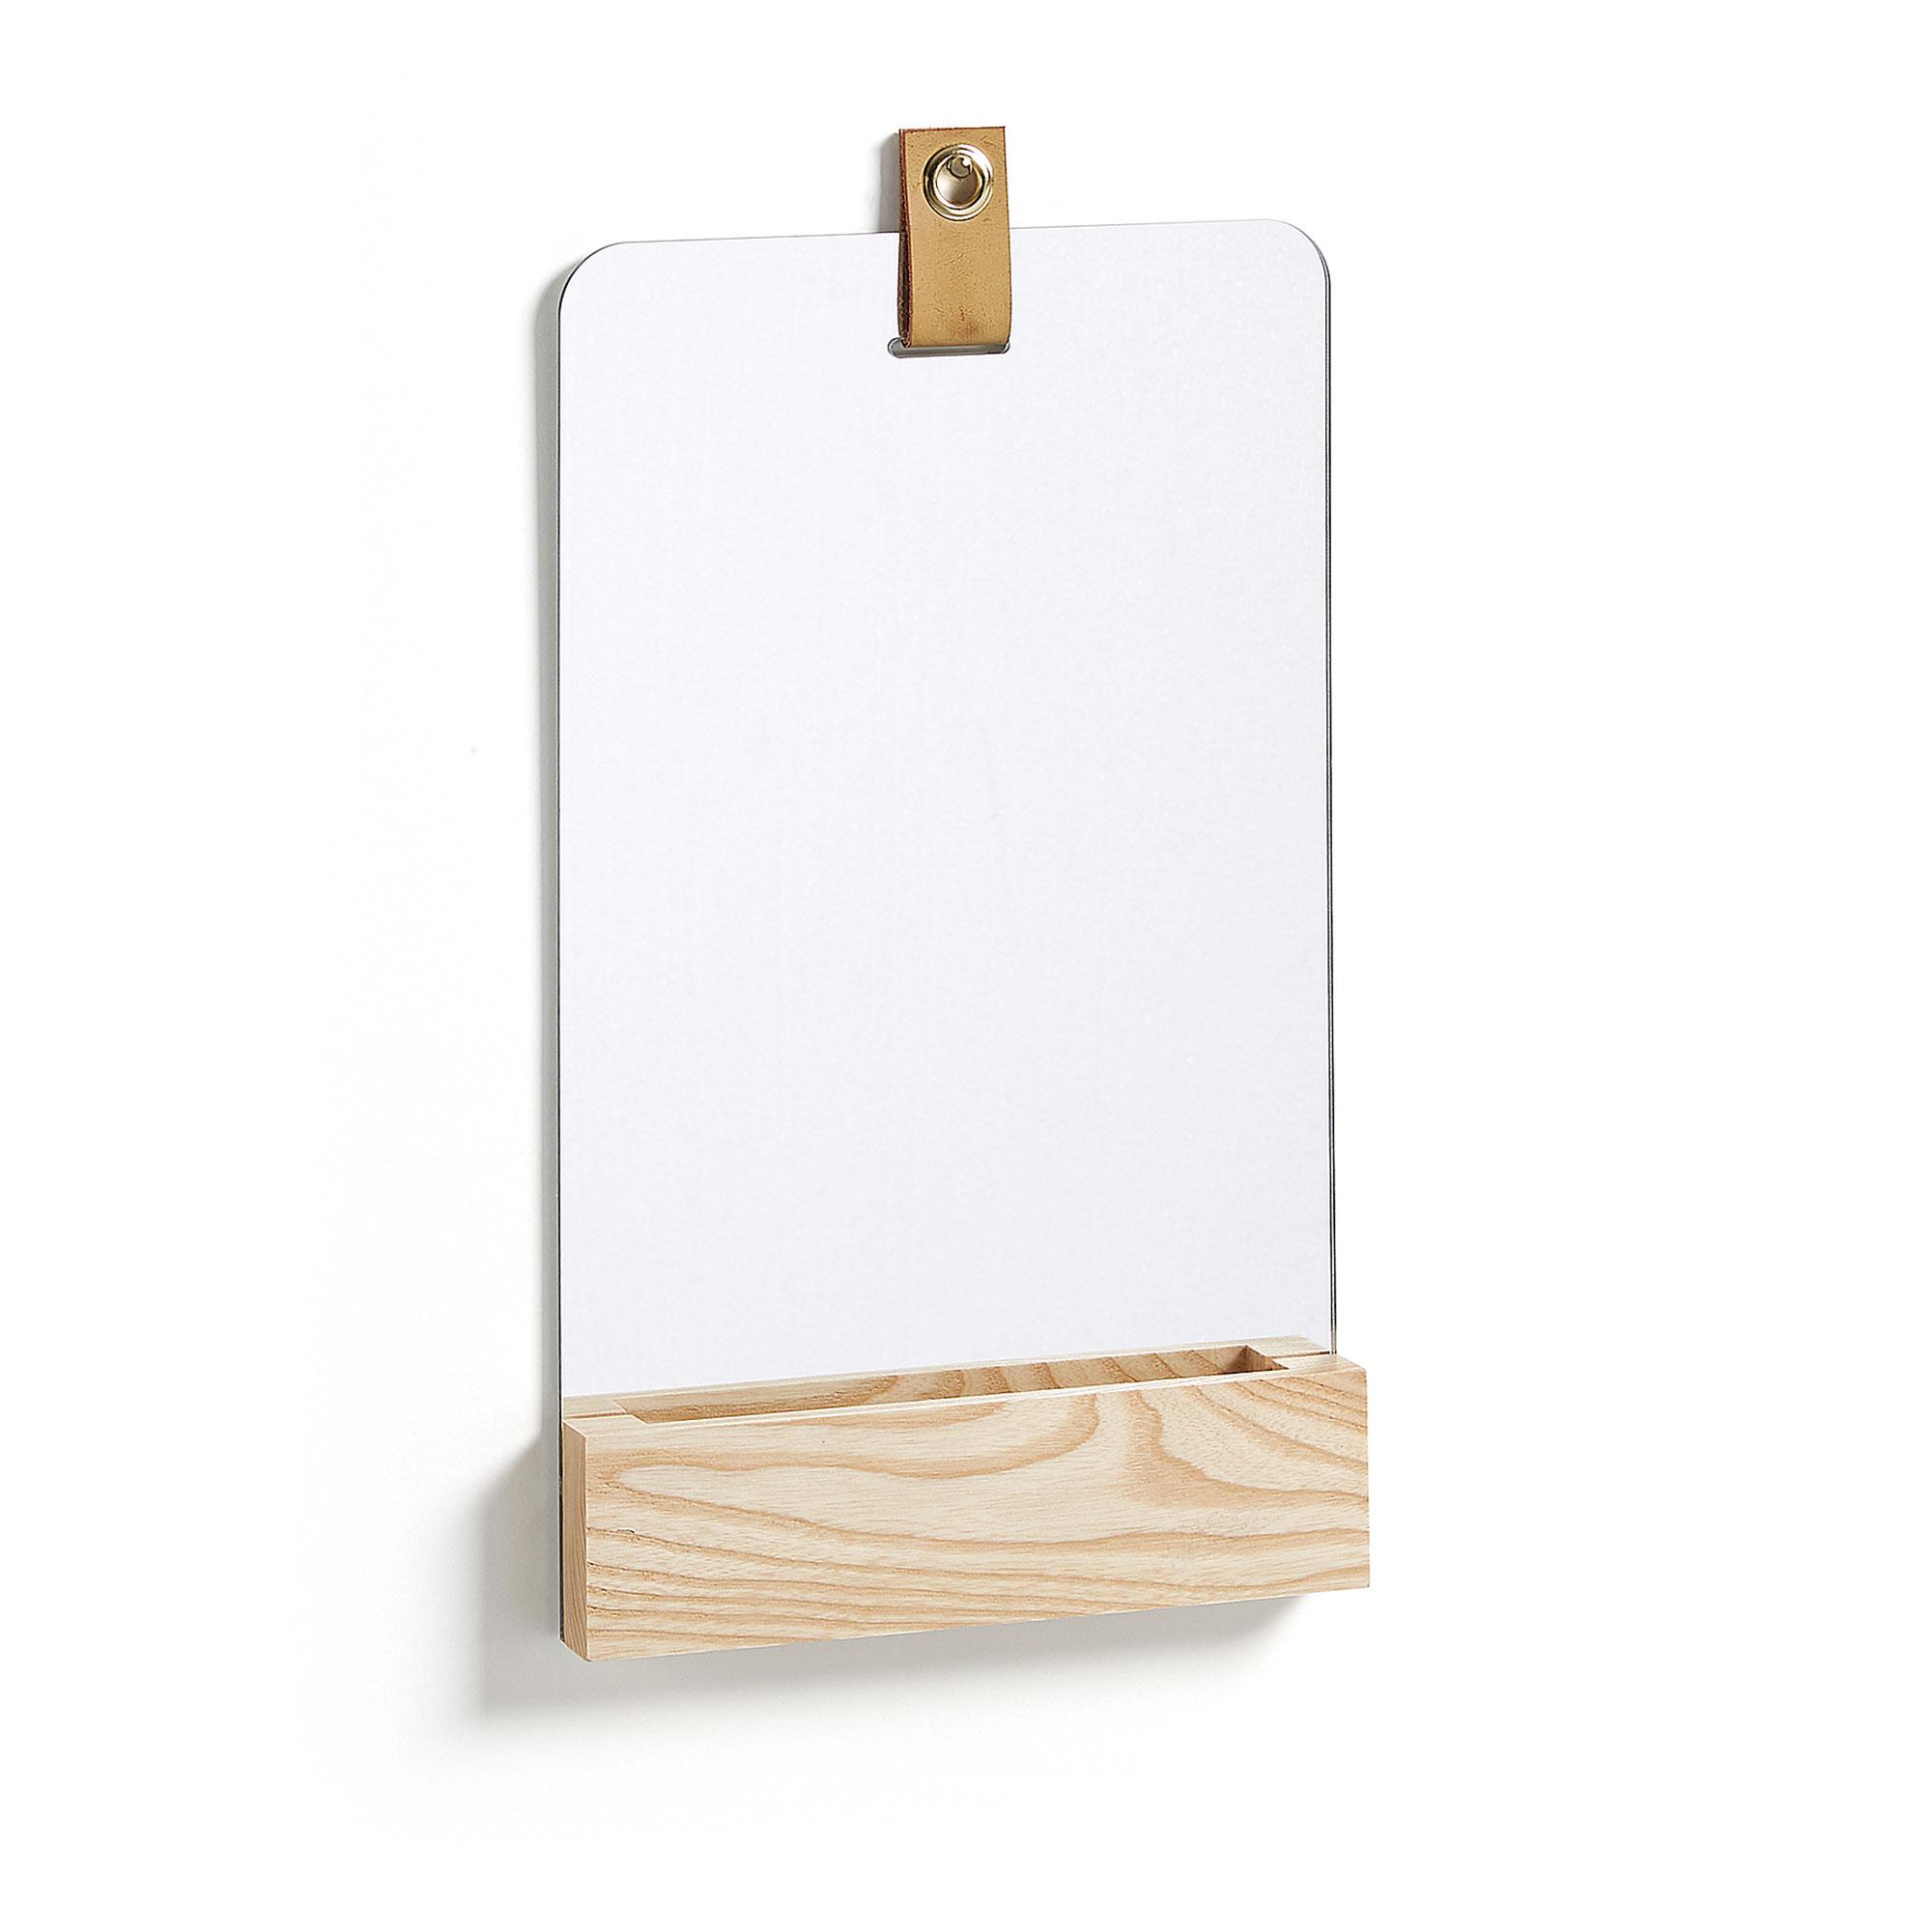 Kave Home Spiegel 'Brant' Recht, 38 x 23cm